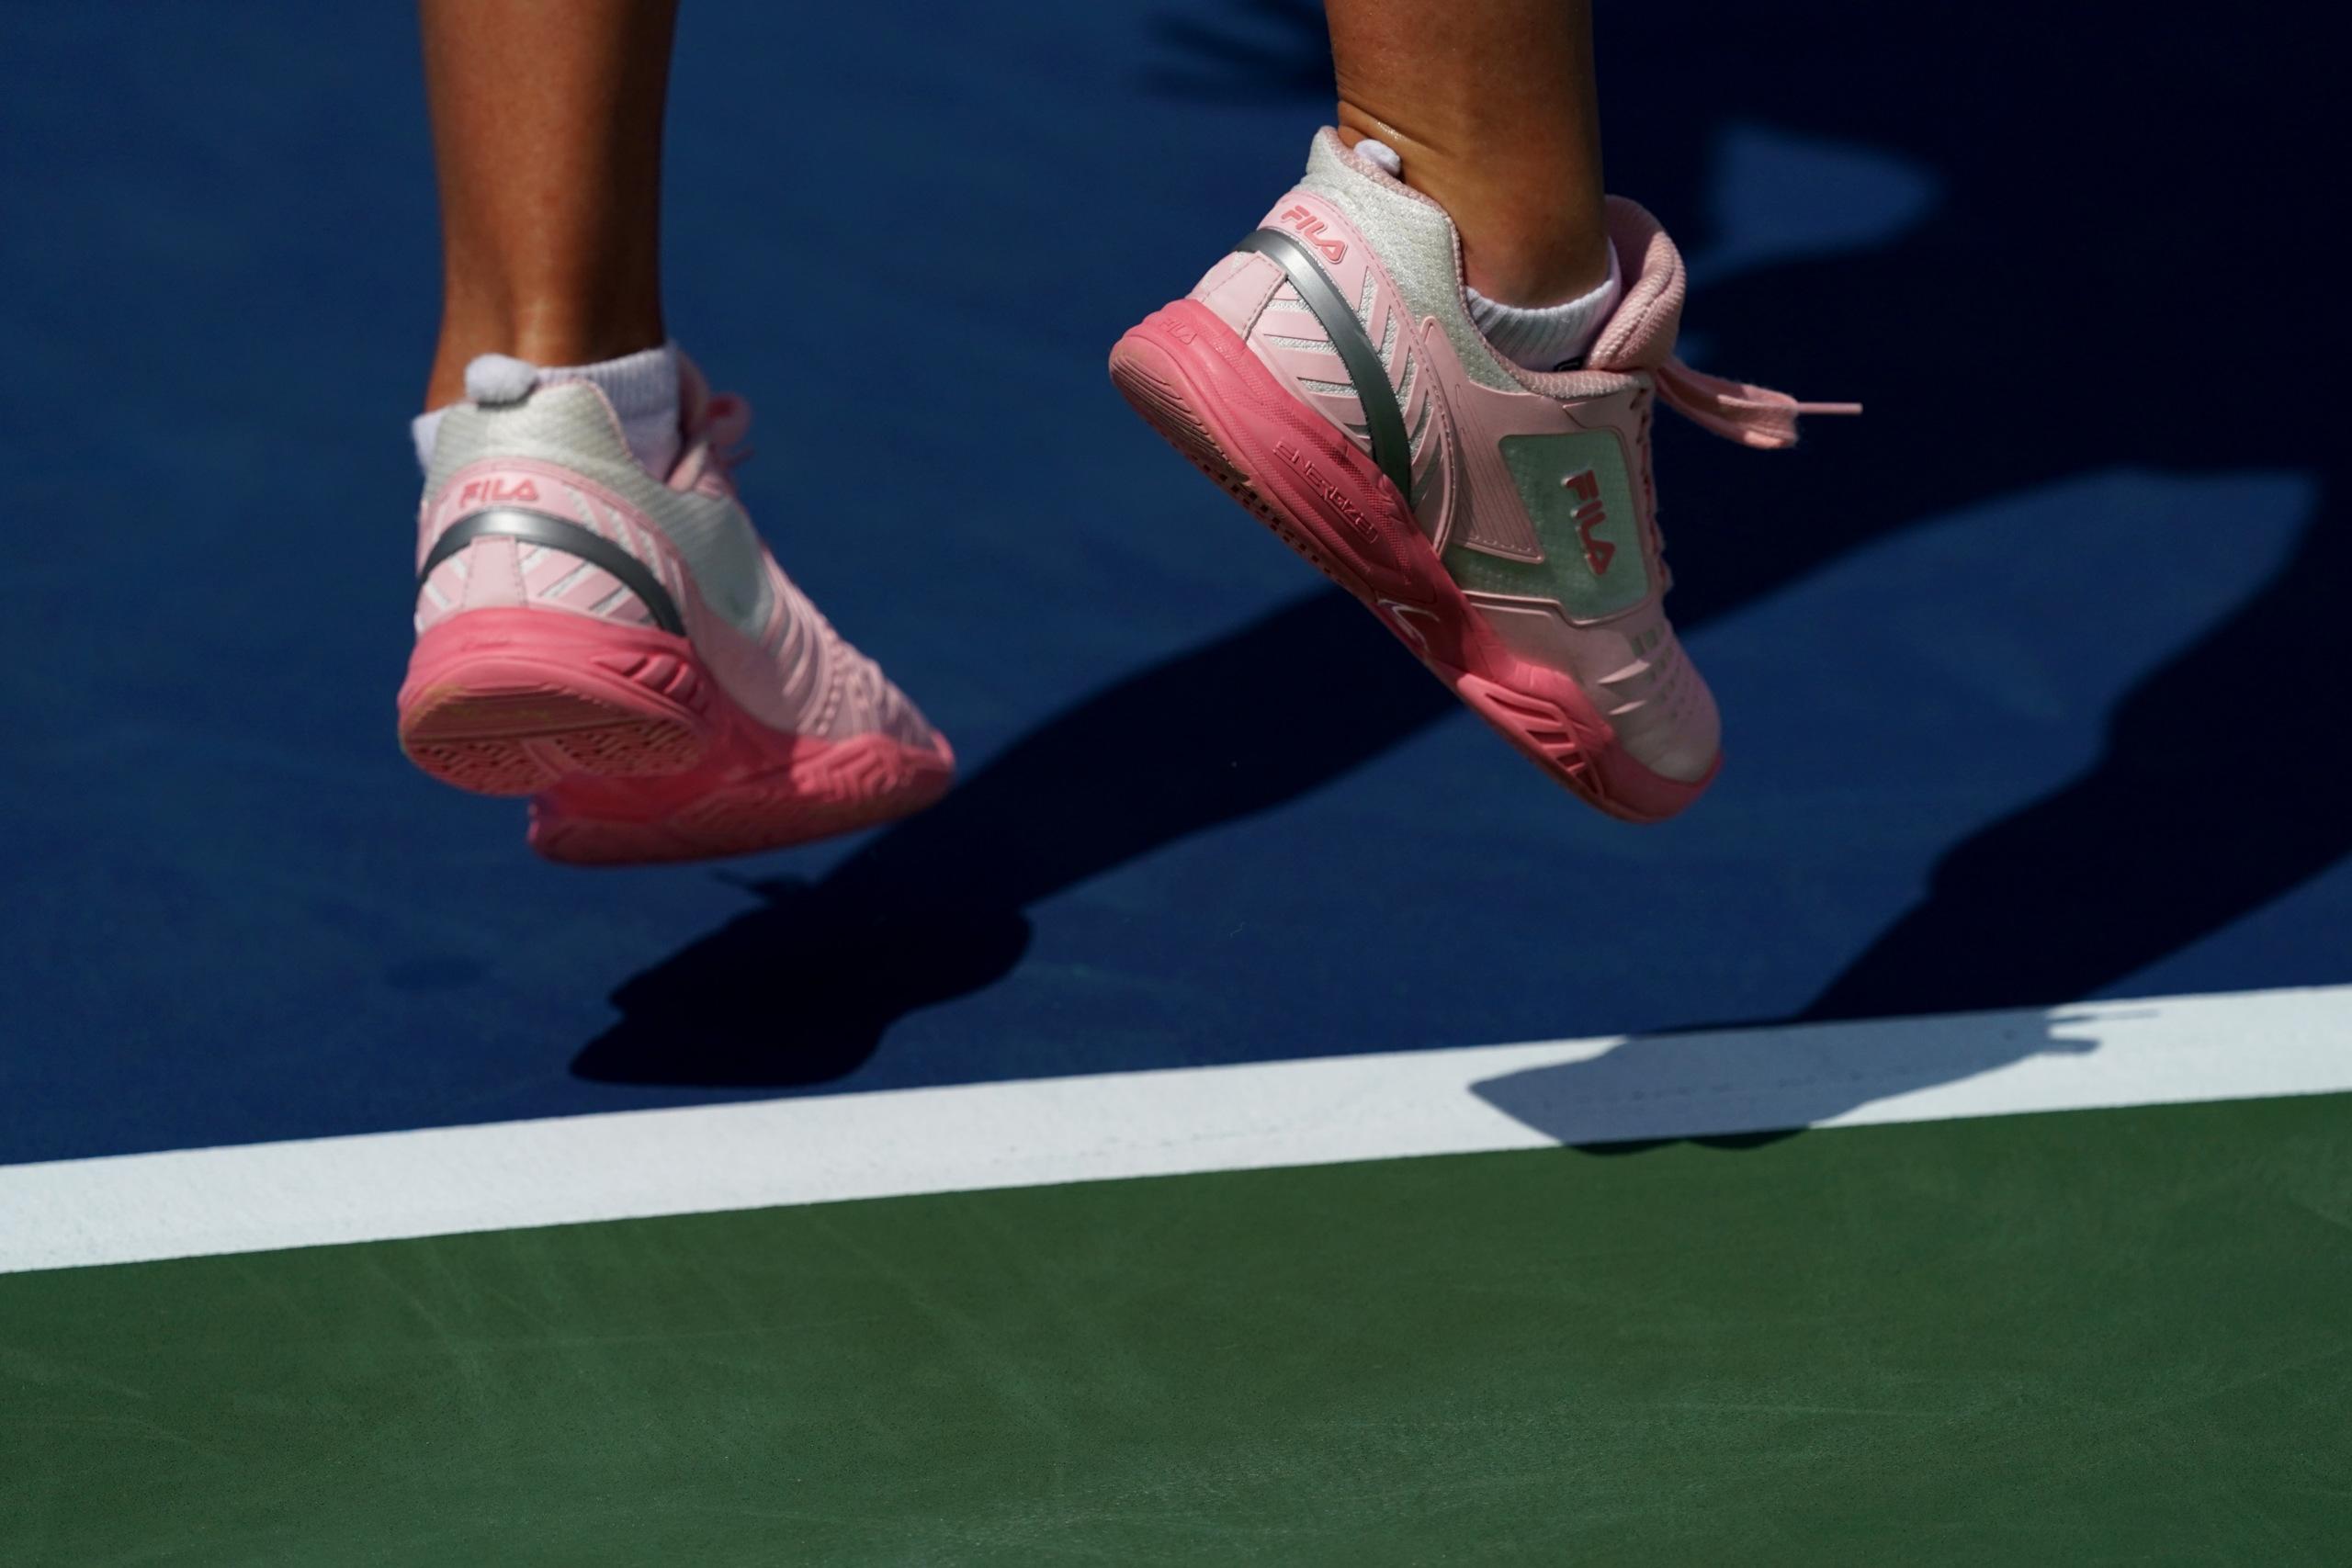 fila-utr-youth-tennis